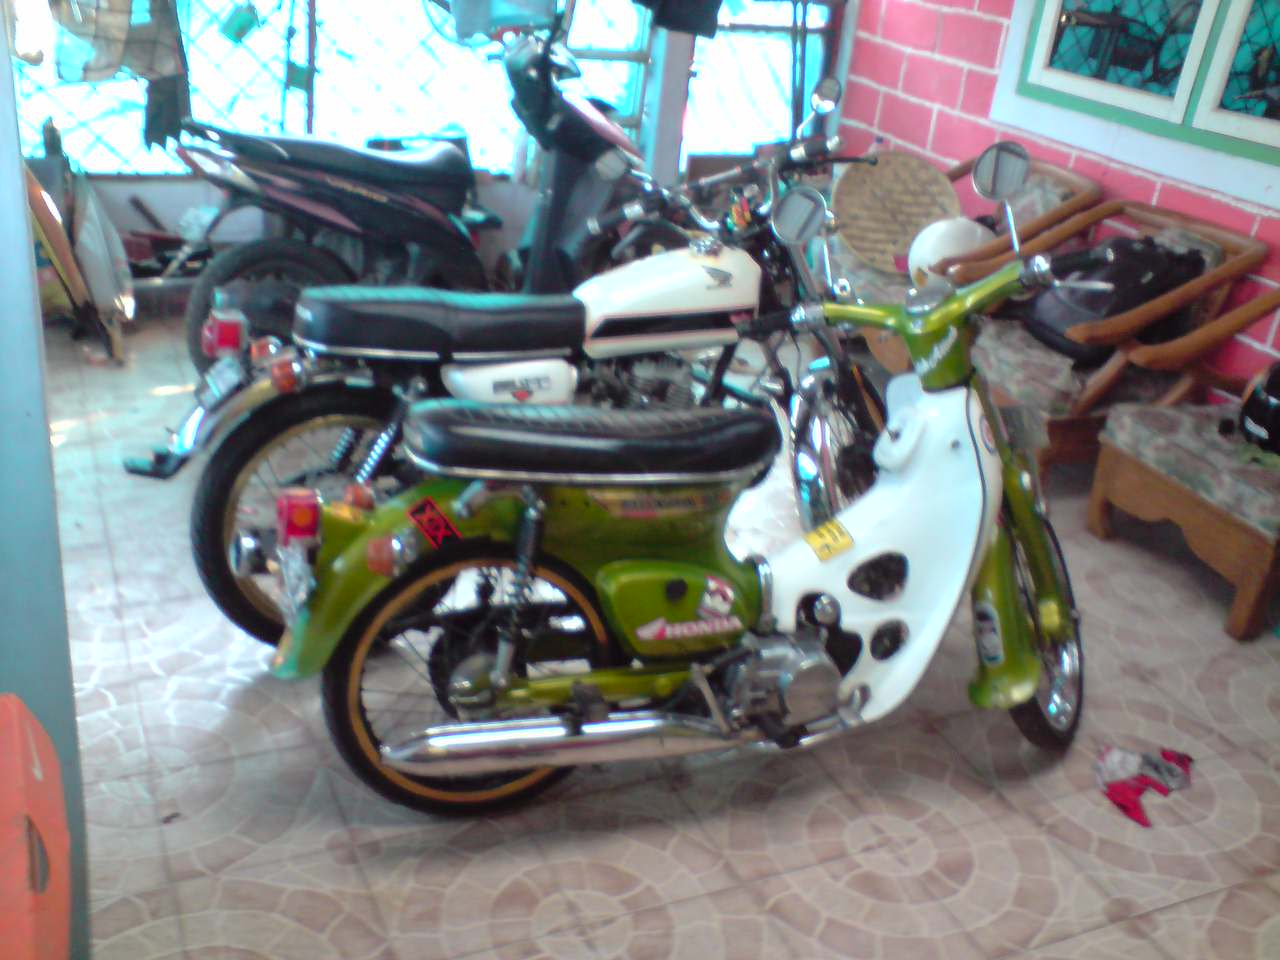 Modifikasi Motor Yamaha Rx King 2004